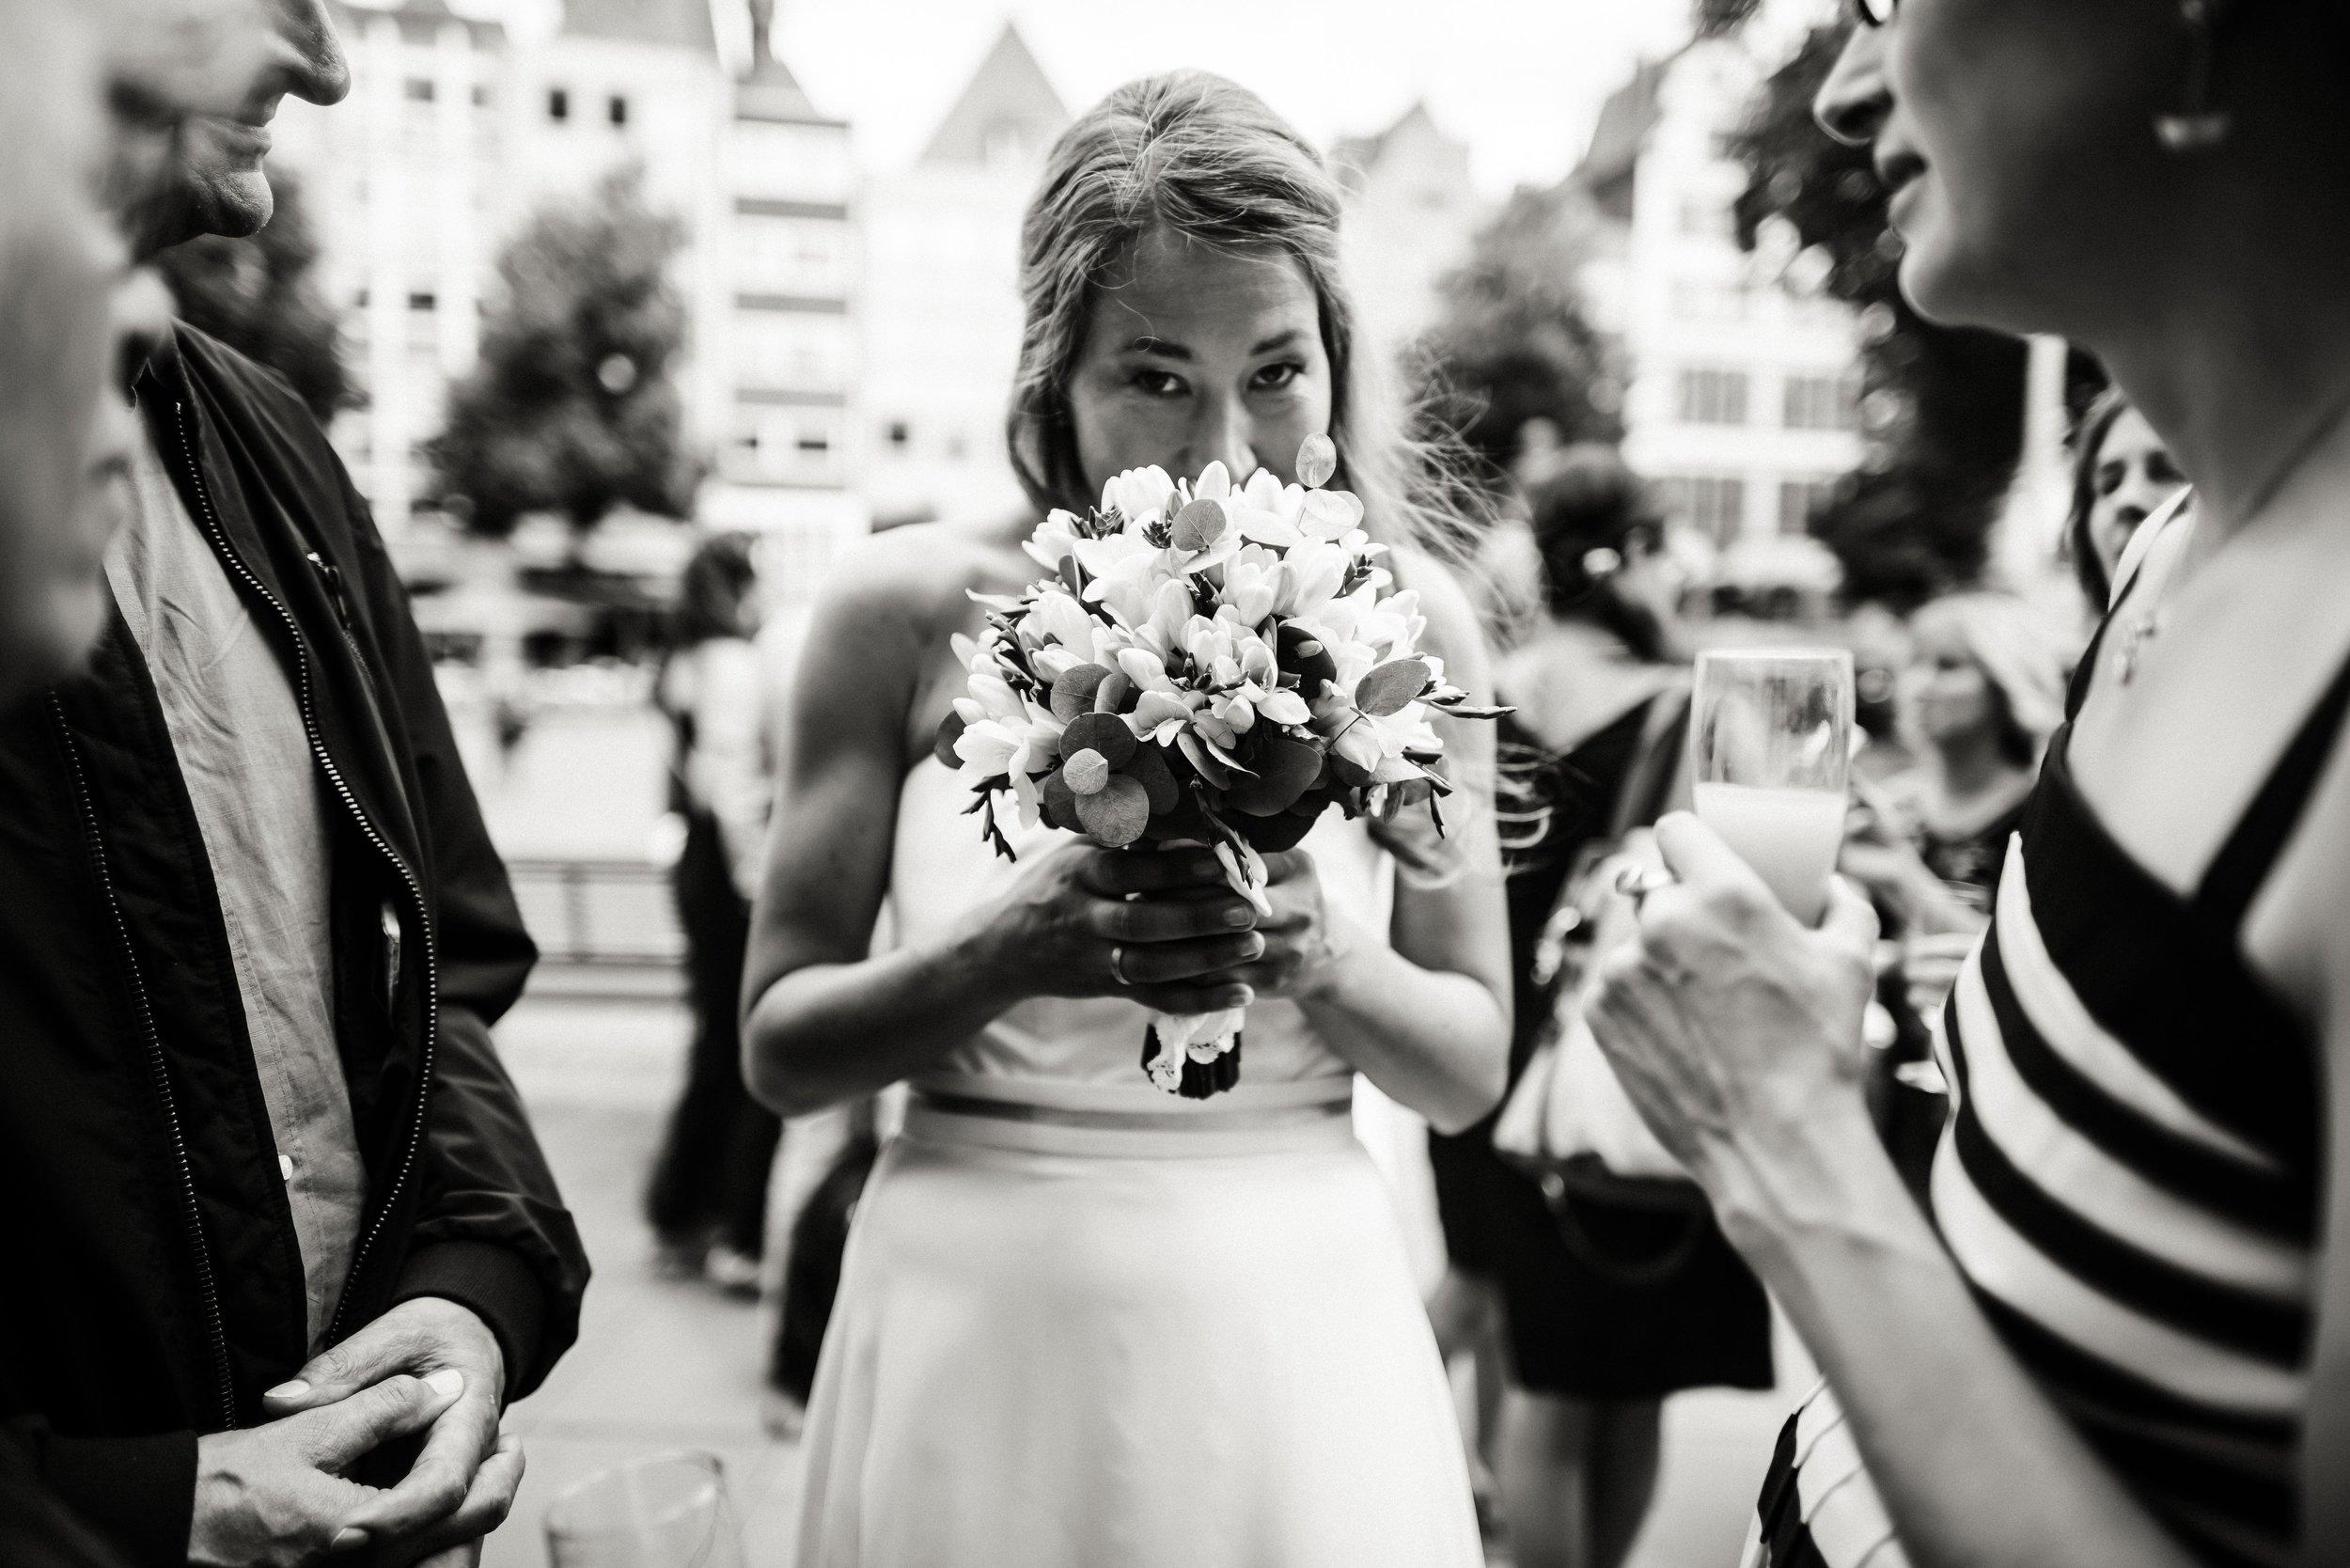 wedding engagement photography john notman photography-1588.jpg